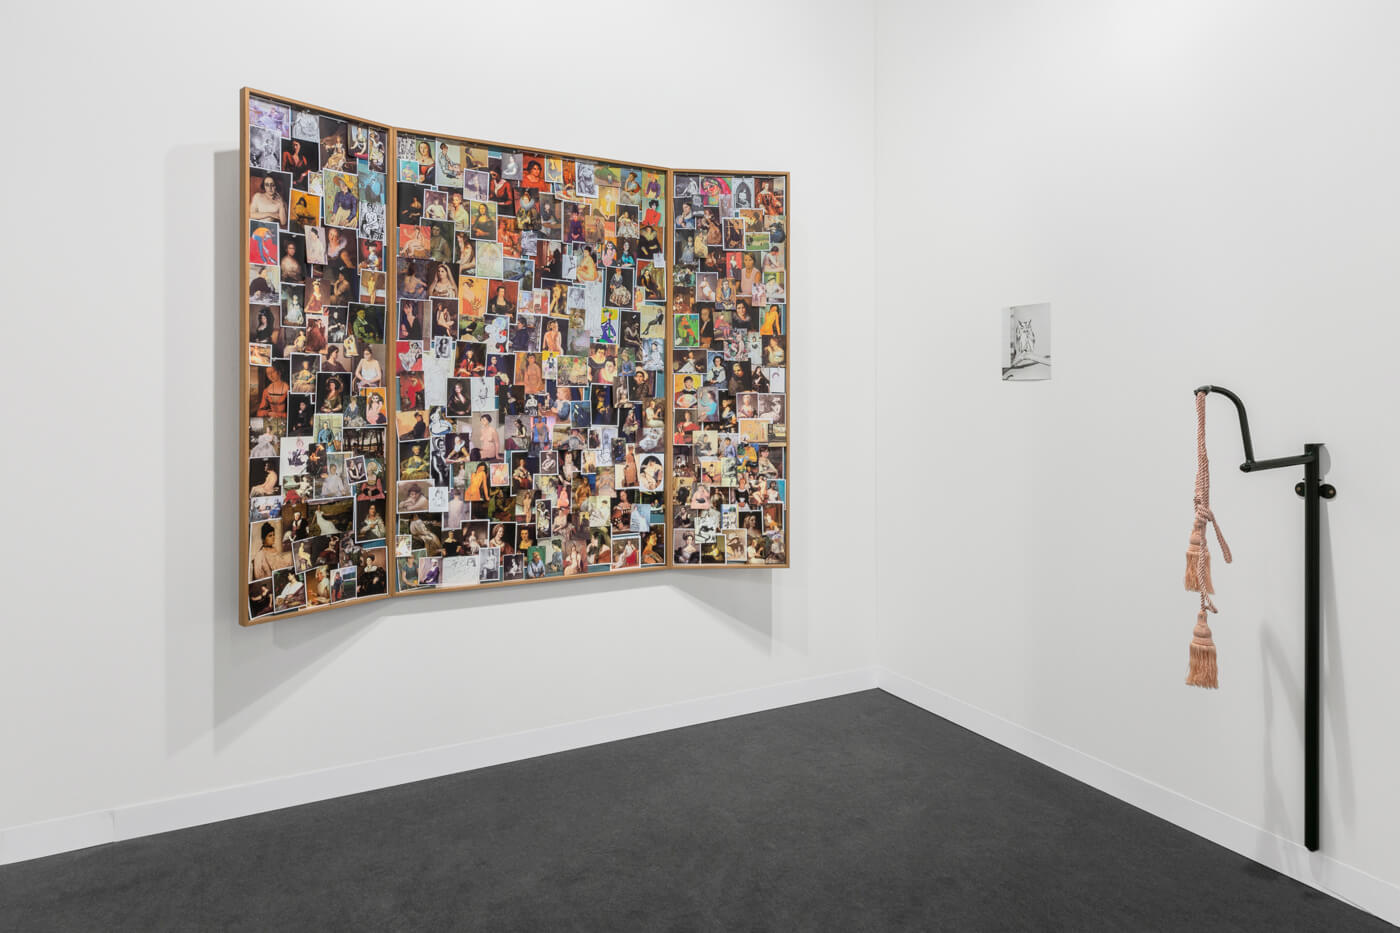 Installation view: ProjecteSD, Hall 2.1, Booth L4   ART BASEL 2019   ProjecteSD